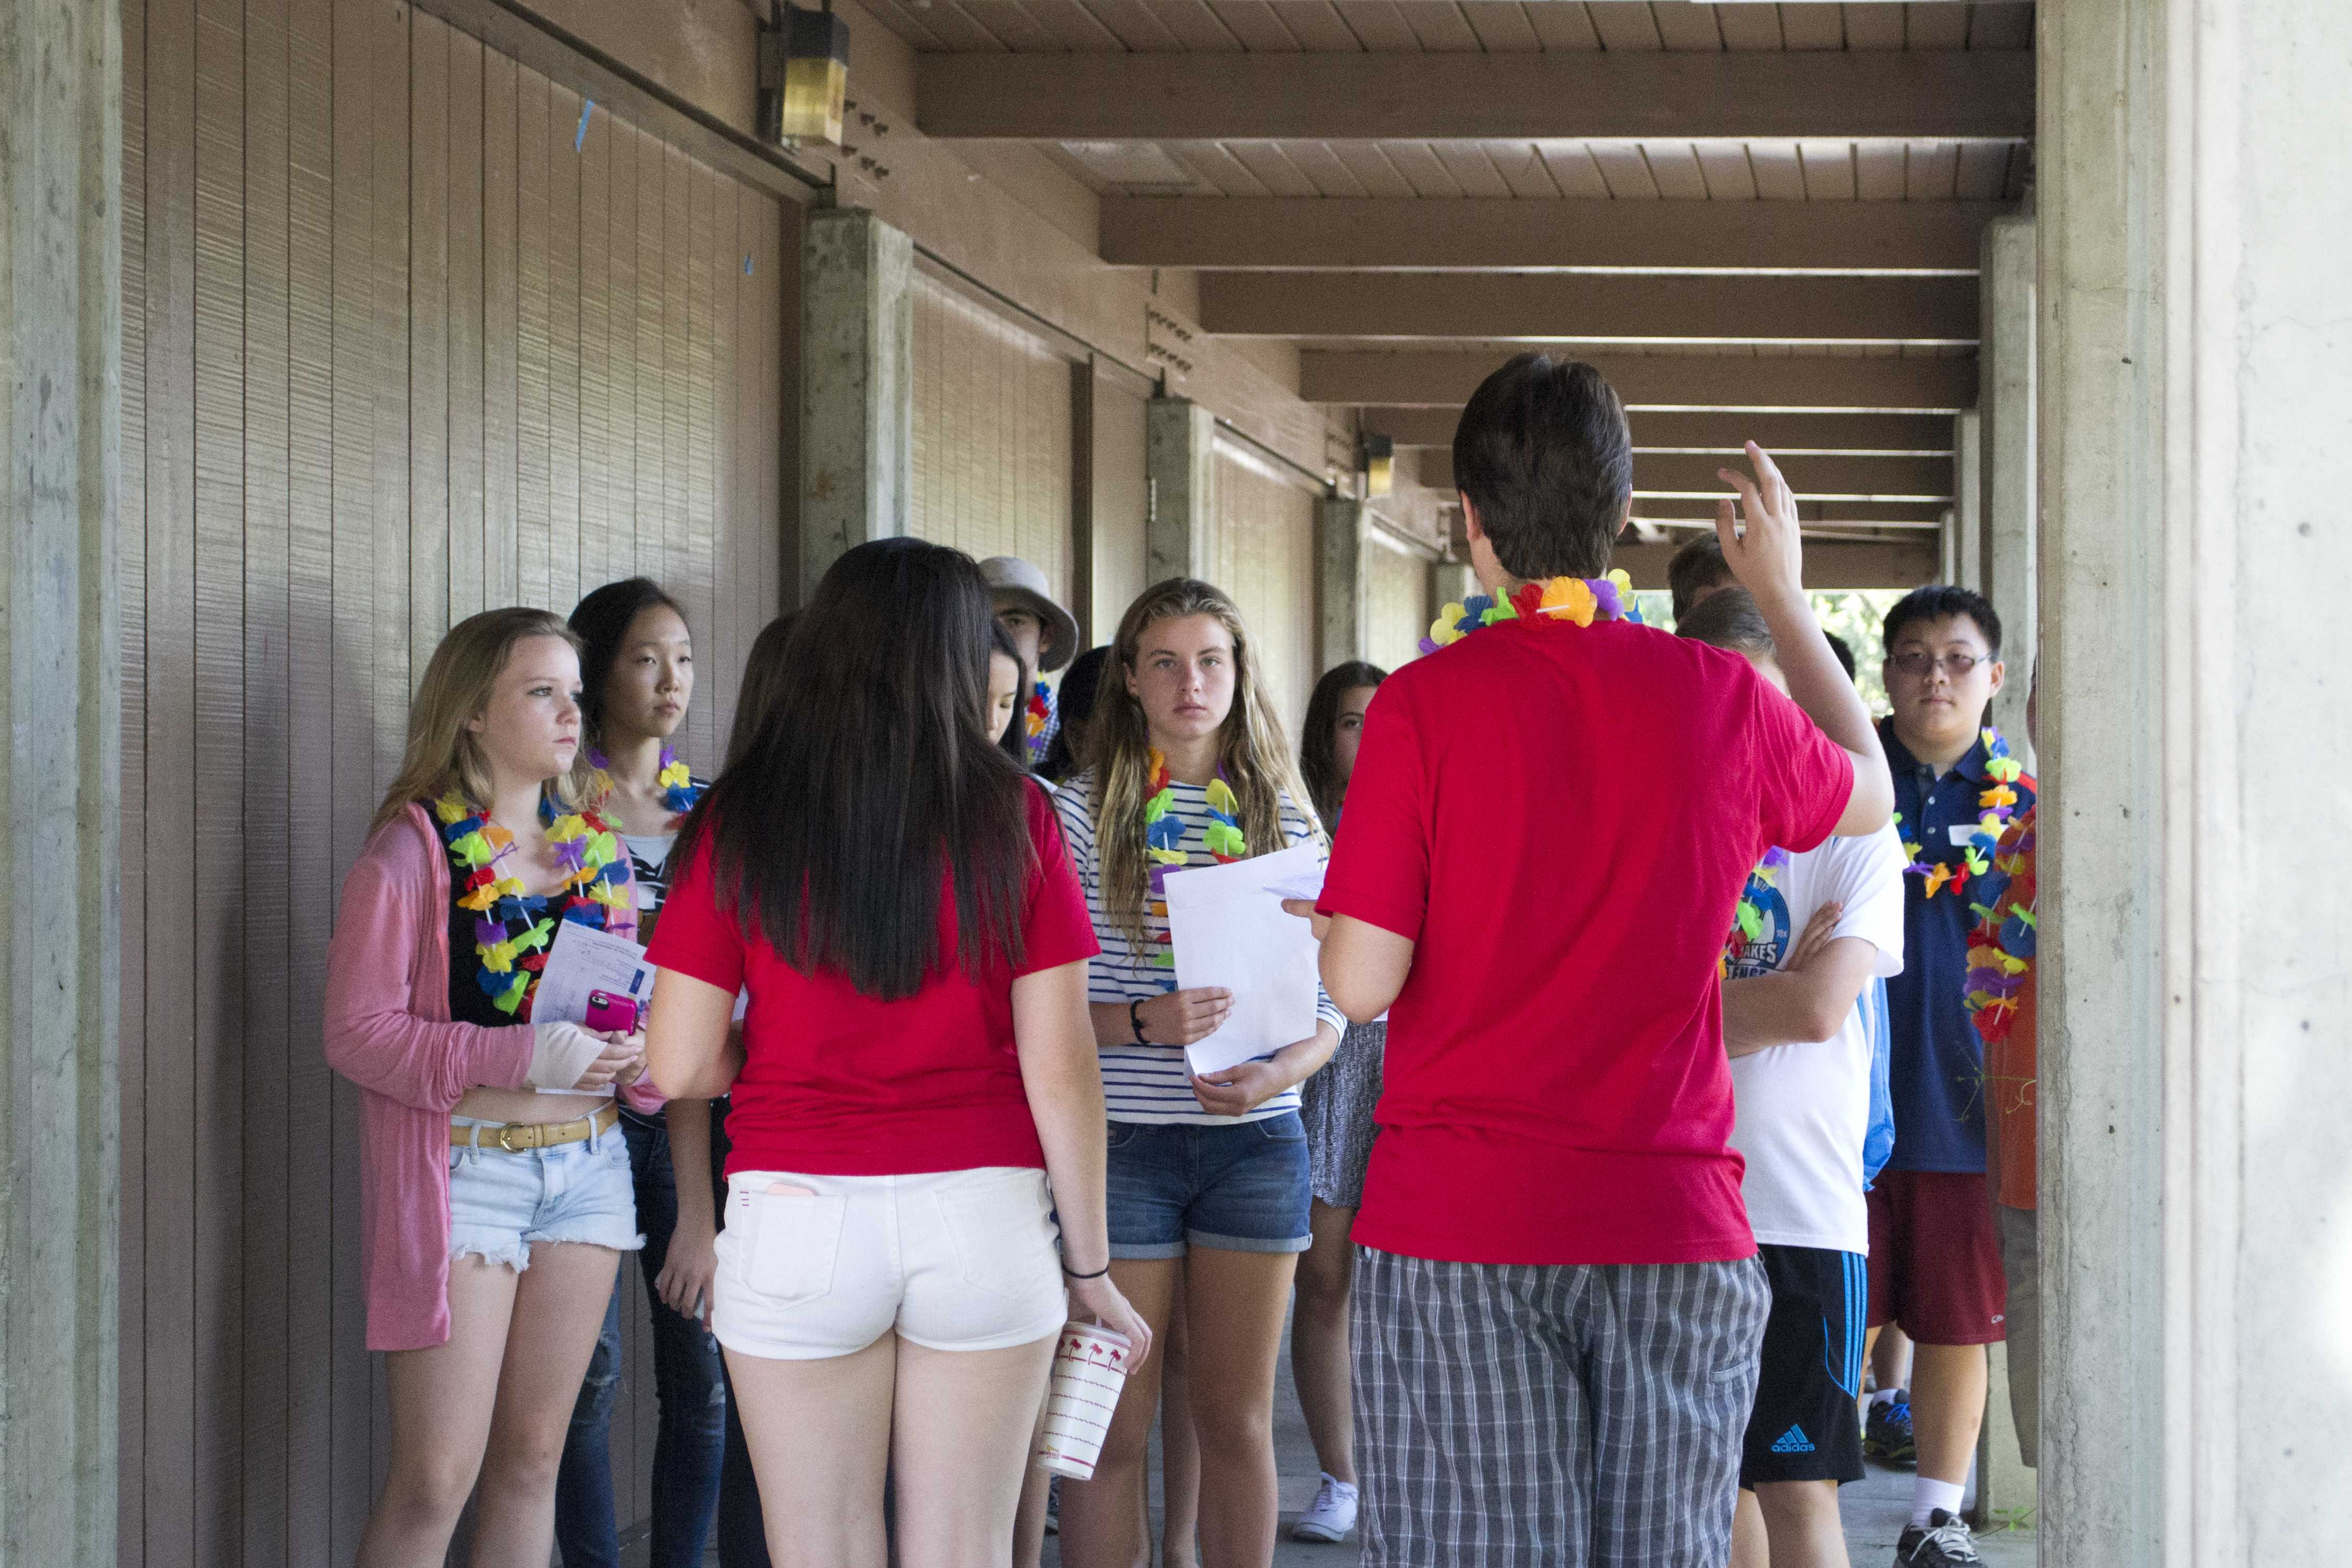 Link Crew Leaders senior Danny Golovinsky and sophomore Sarah Reich guide their group of freshmen through Gunn's campus.